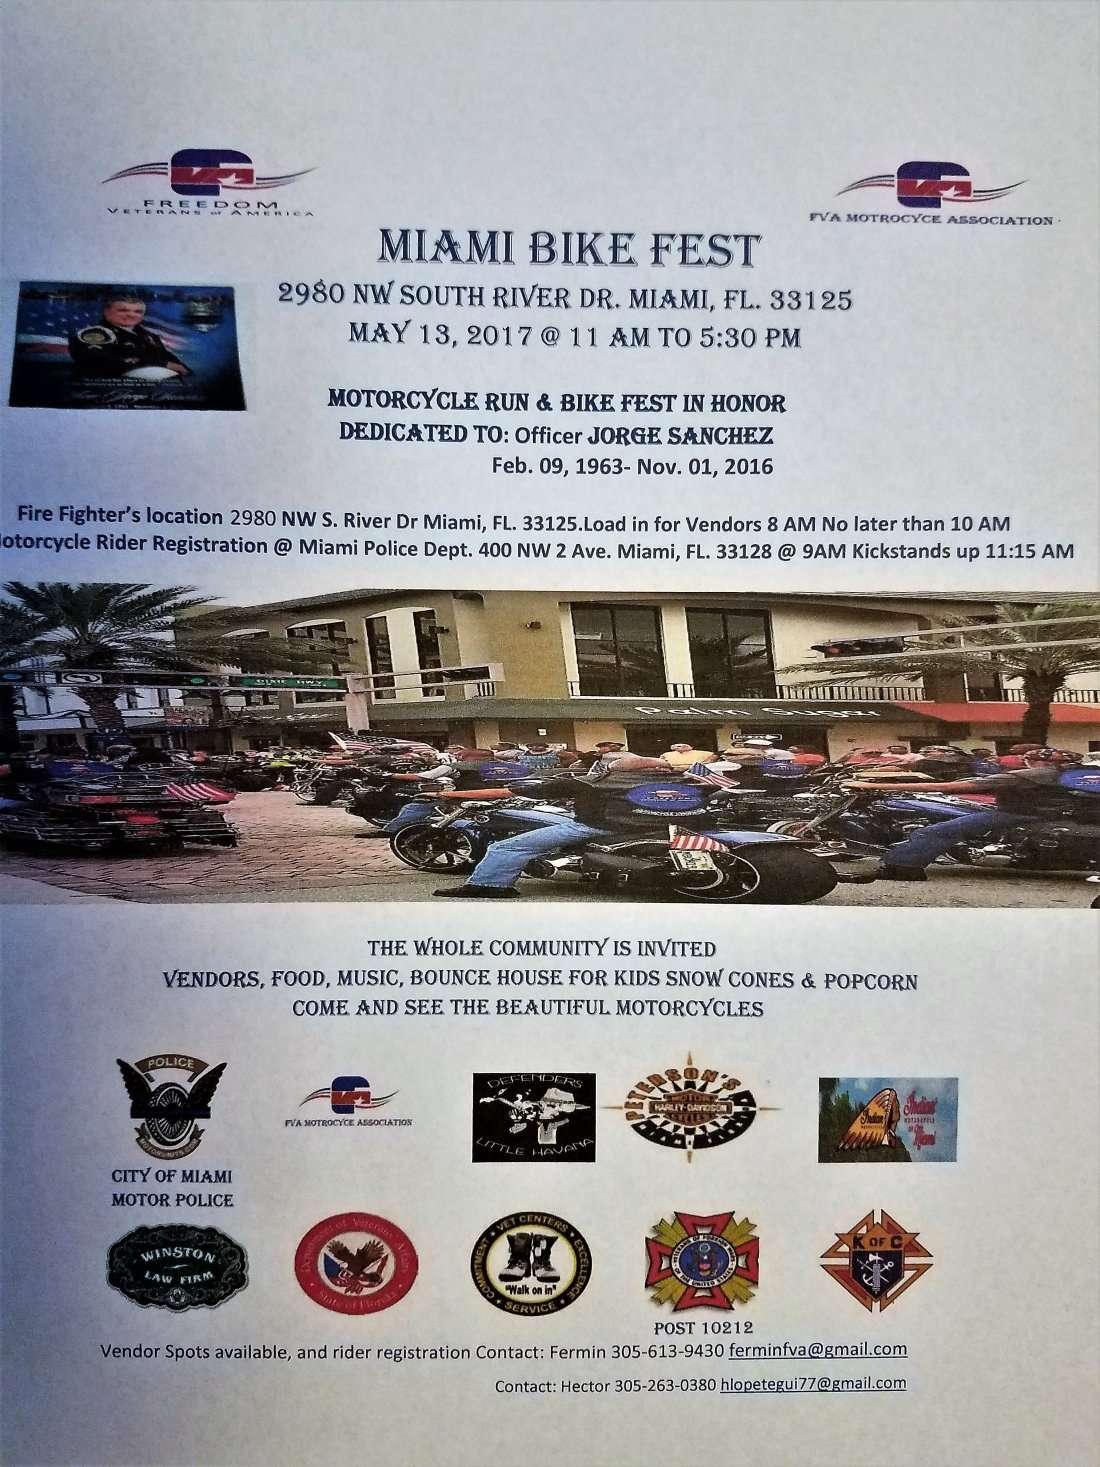 Miami Bike Fest